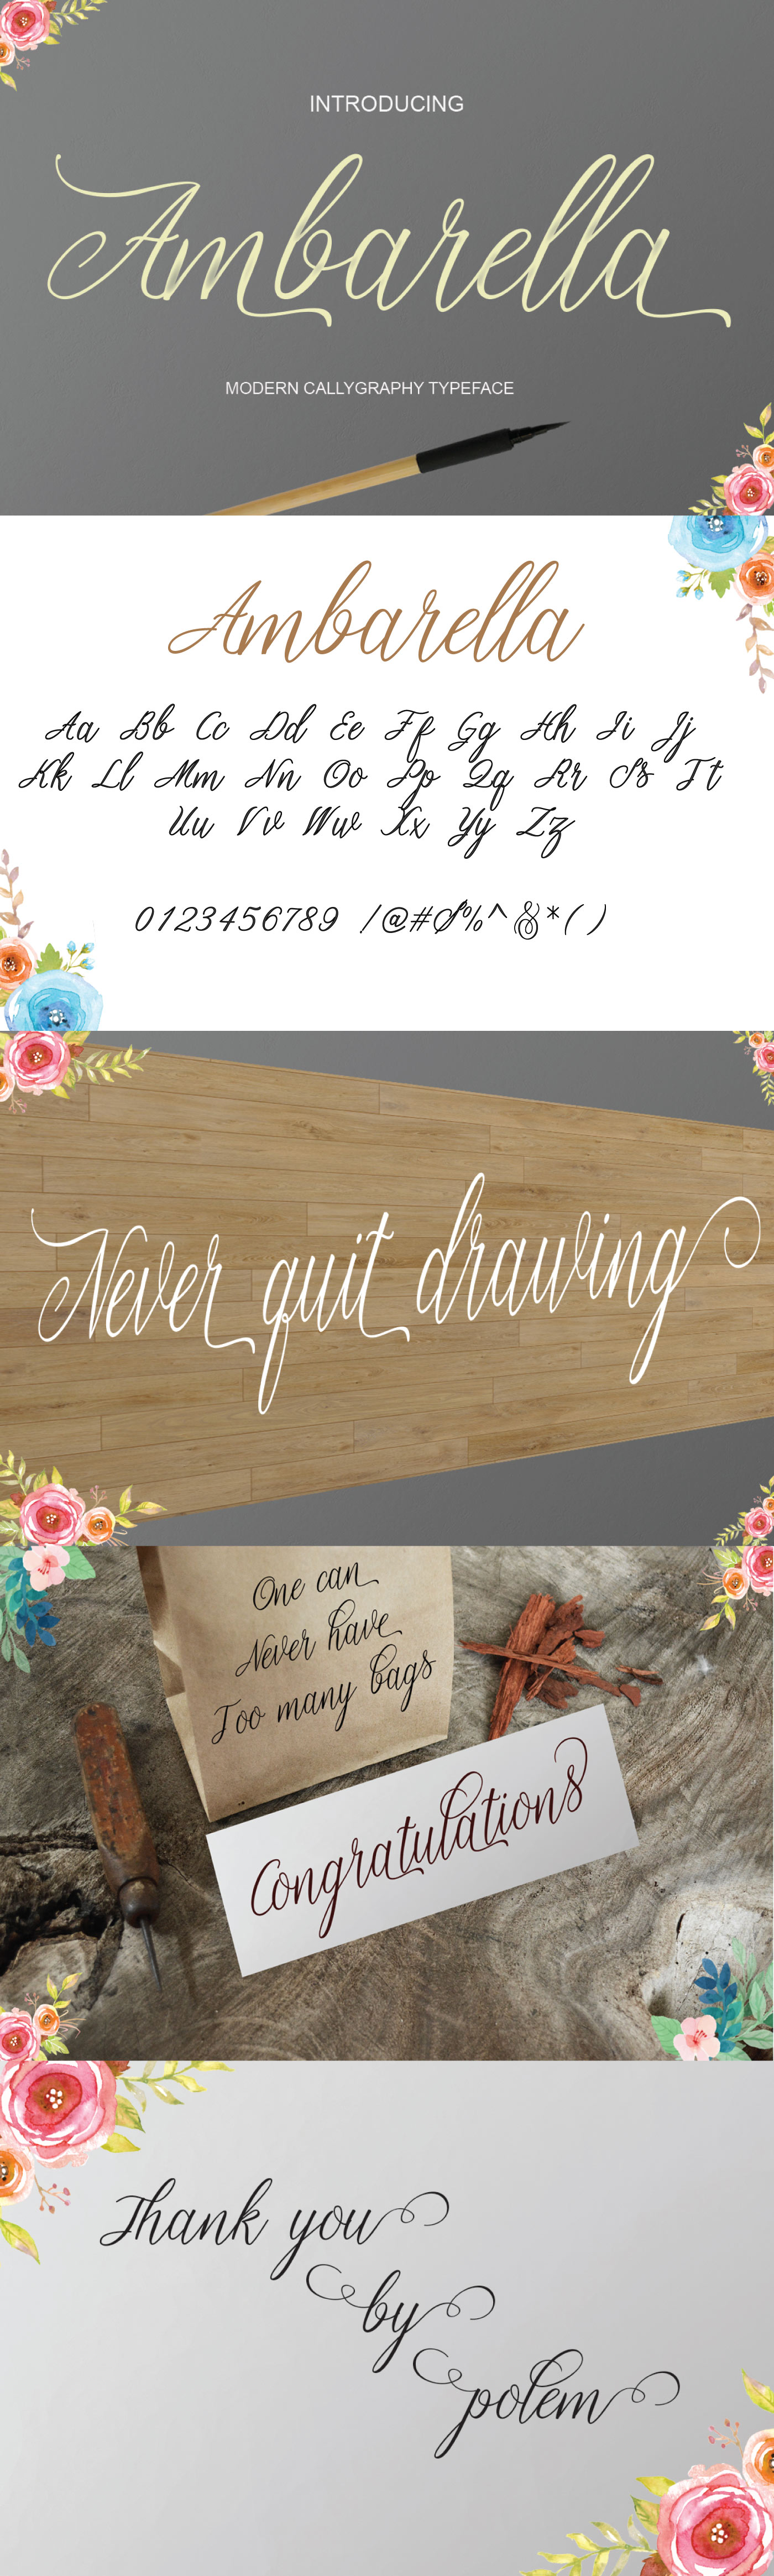 Ambarella-Free-Modern-Calligraphy-Typeface